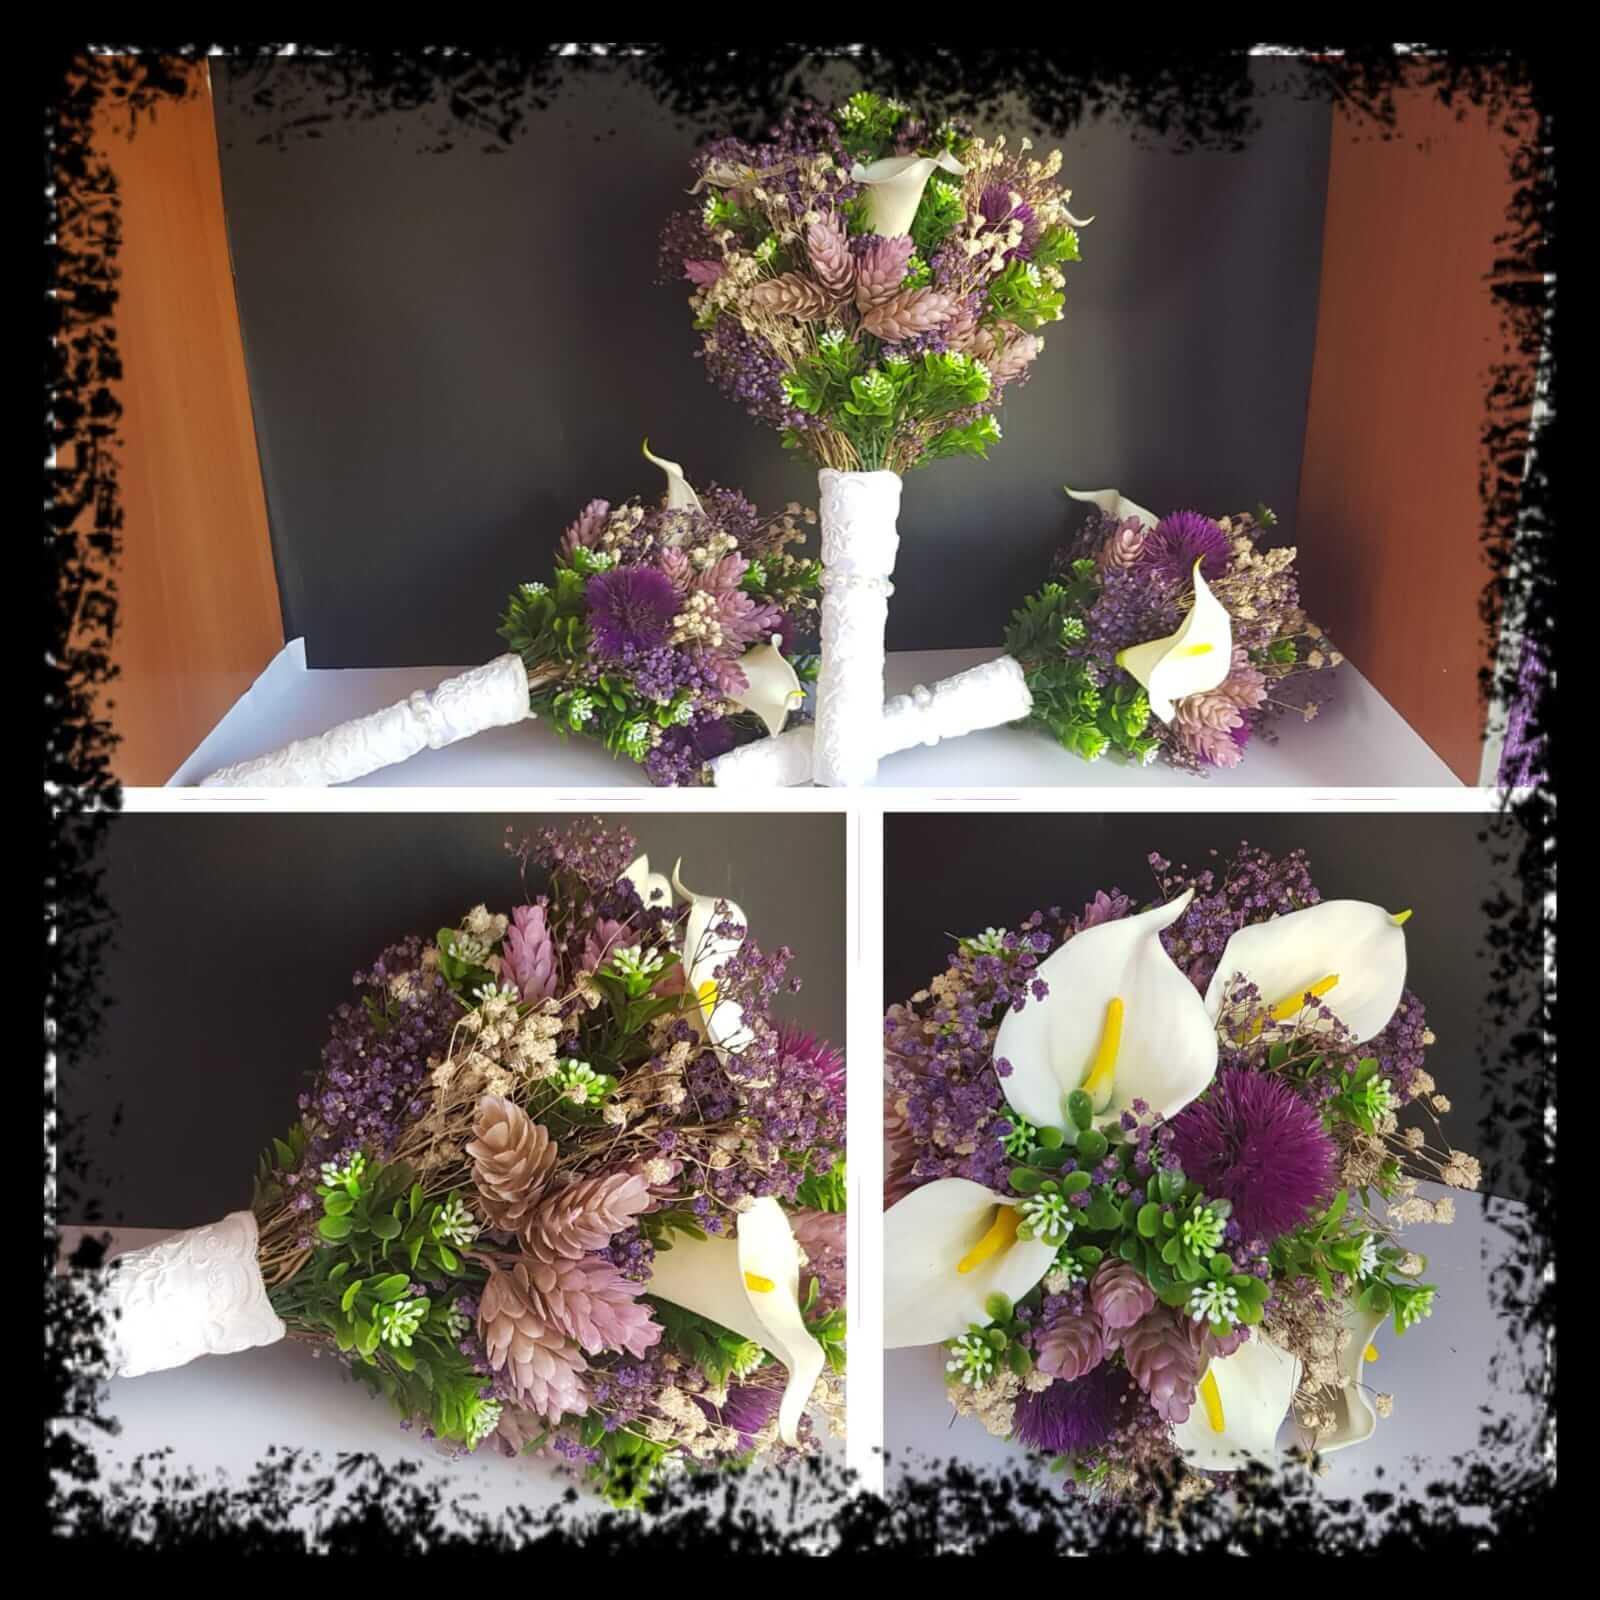 ramo de novia ramo de novia - ramos novia 9 - Ramo de novia